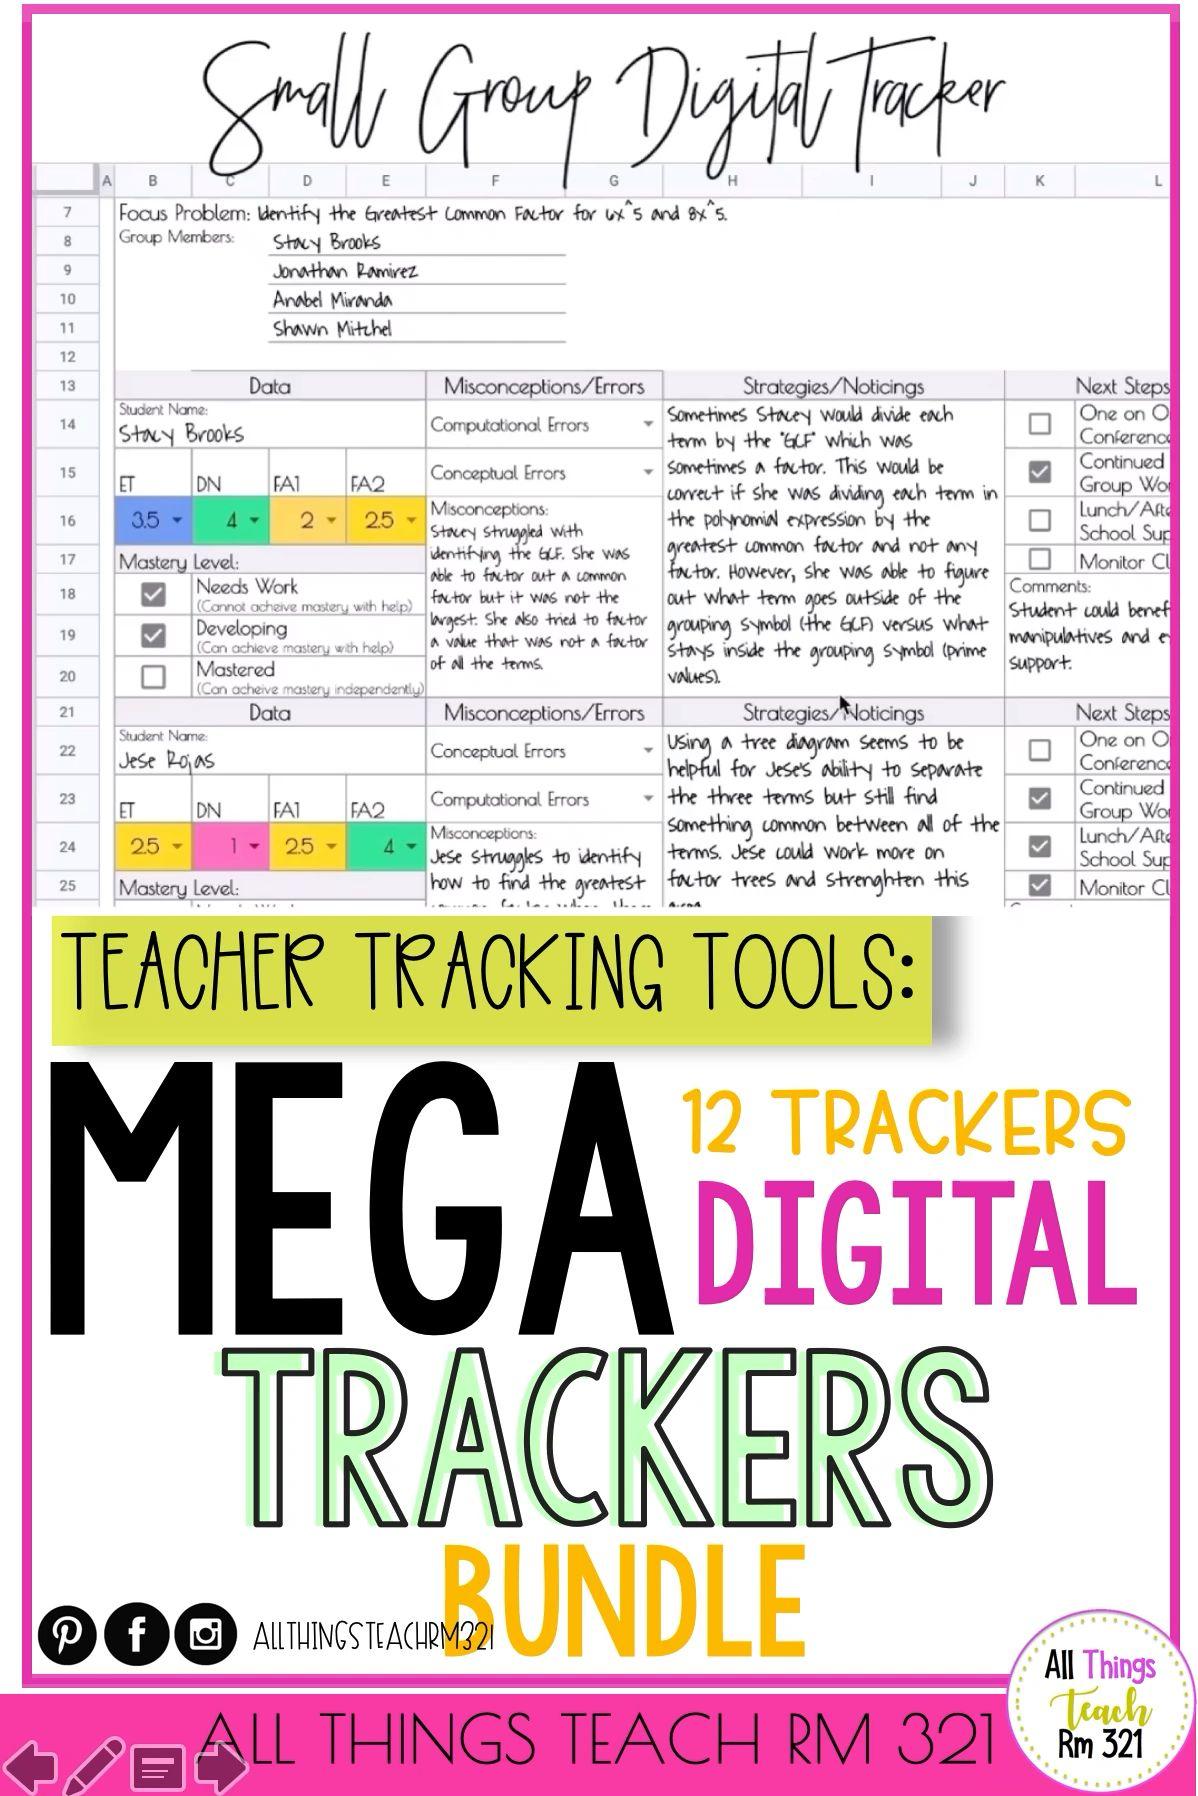 Photo of MEGA TRACKERS Bundle: 12 DIGITAL Trackers +… by All Things Teach Rm 321 | Teachers Pay Teachers